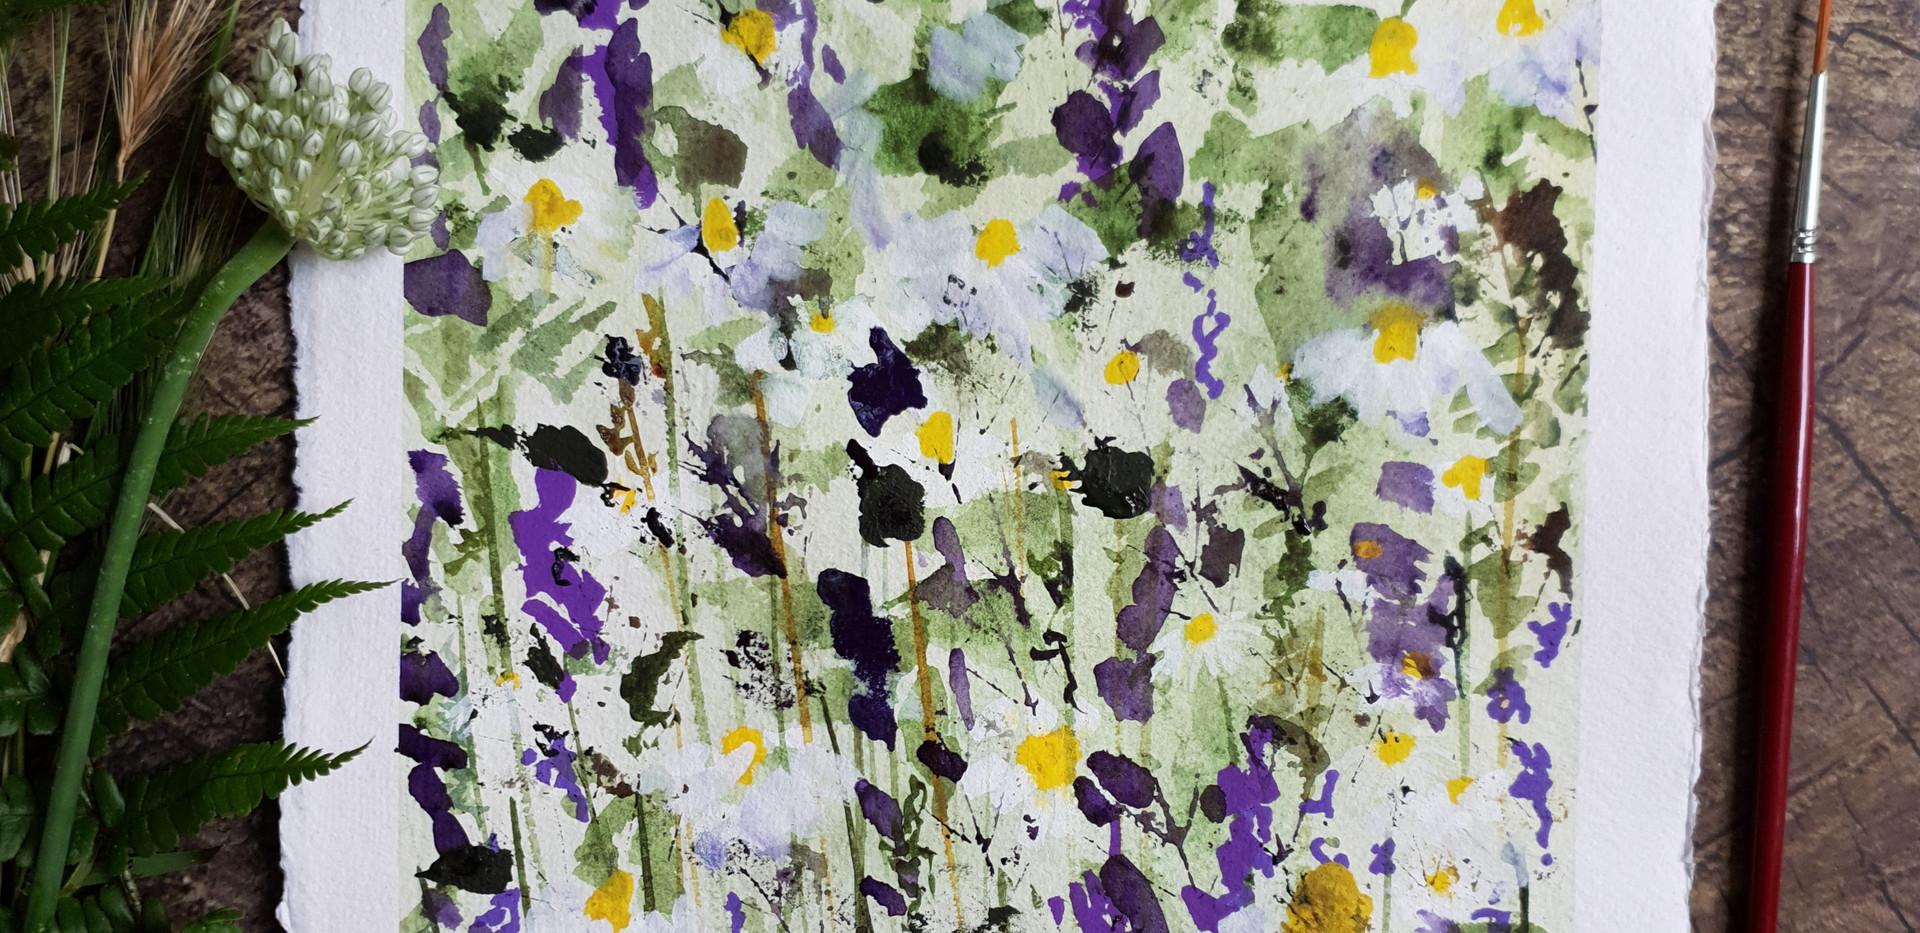 Walking through the Wildflowers